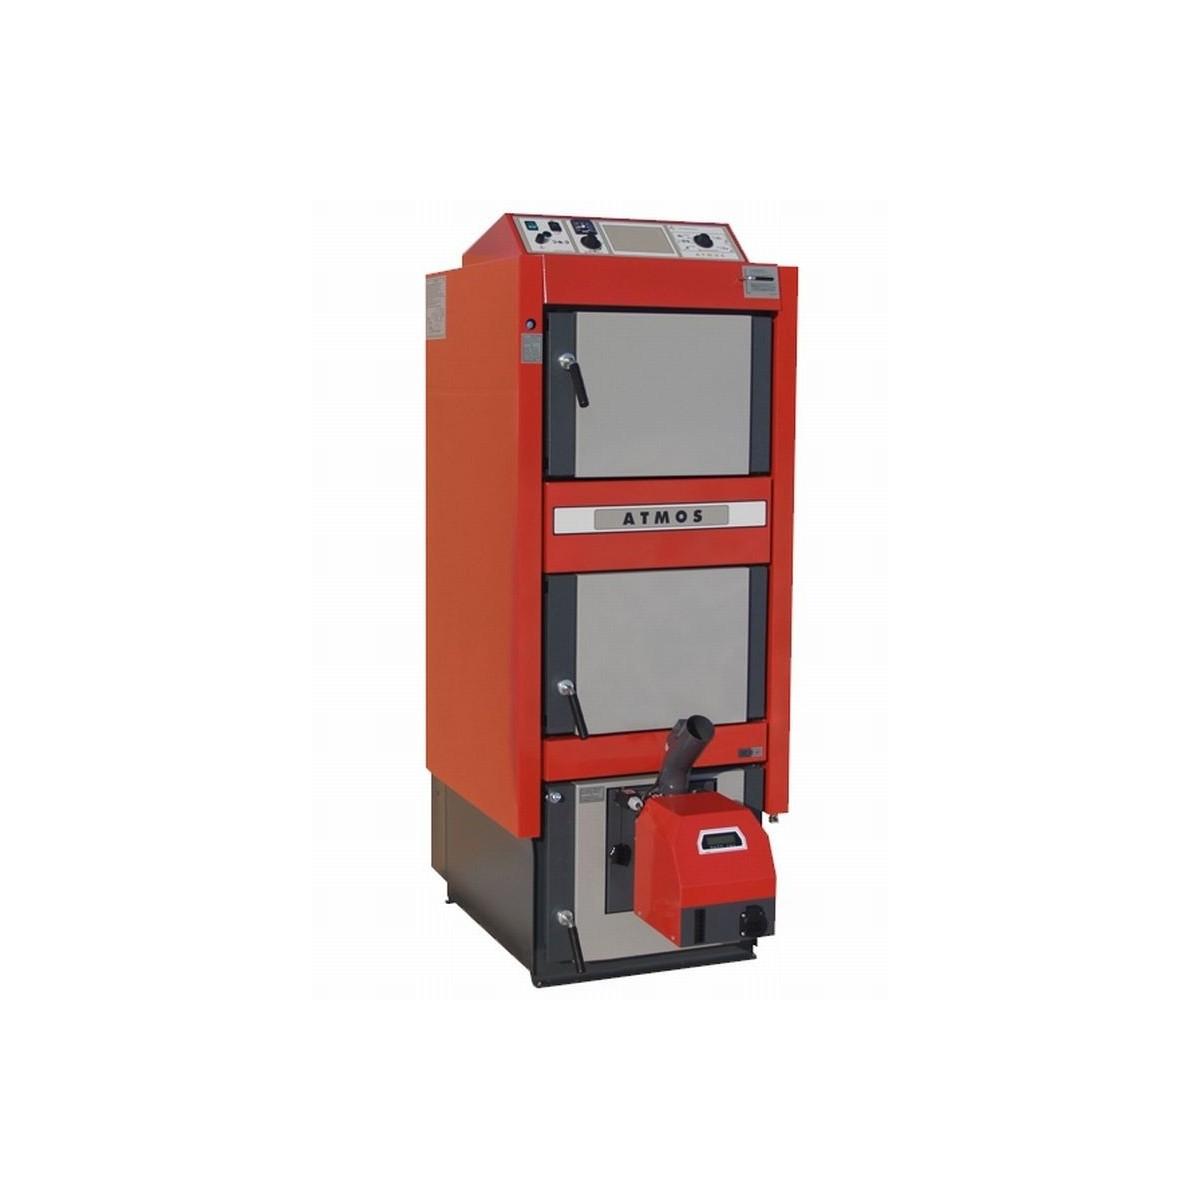 Atmos caldera gasificacion comb. leña/pellets dc32sp 35/6-20kw (sin kit ni quemador)